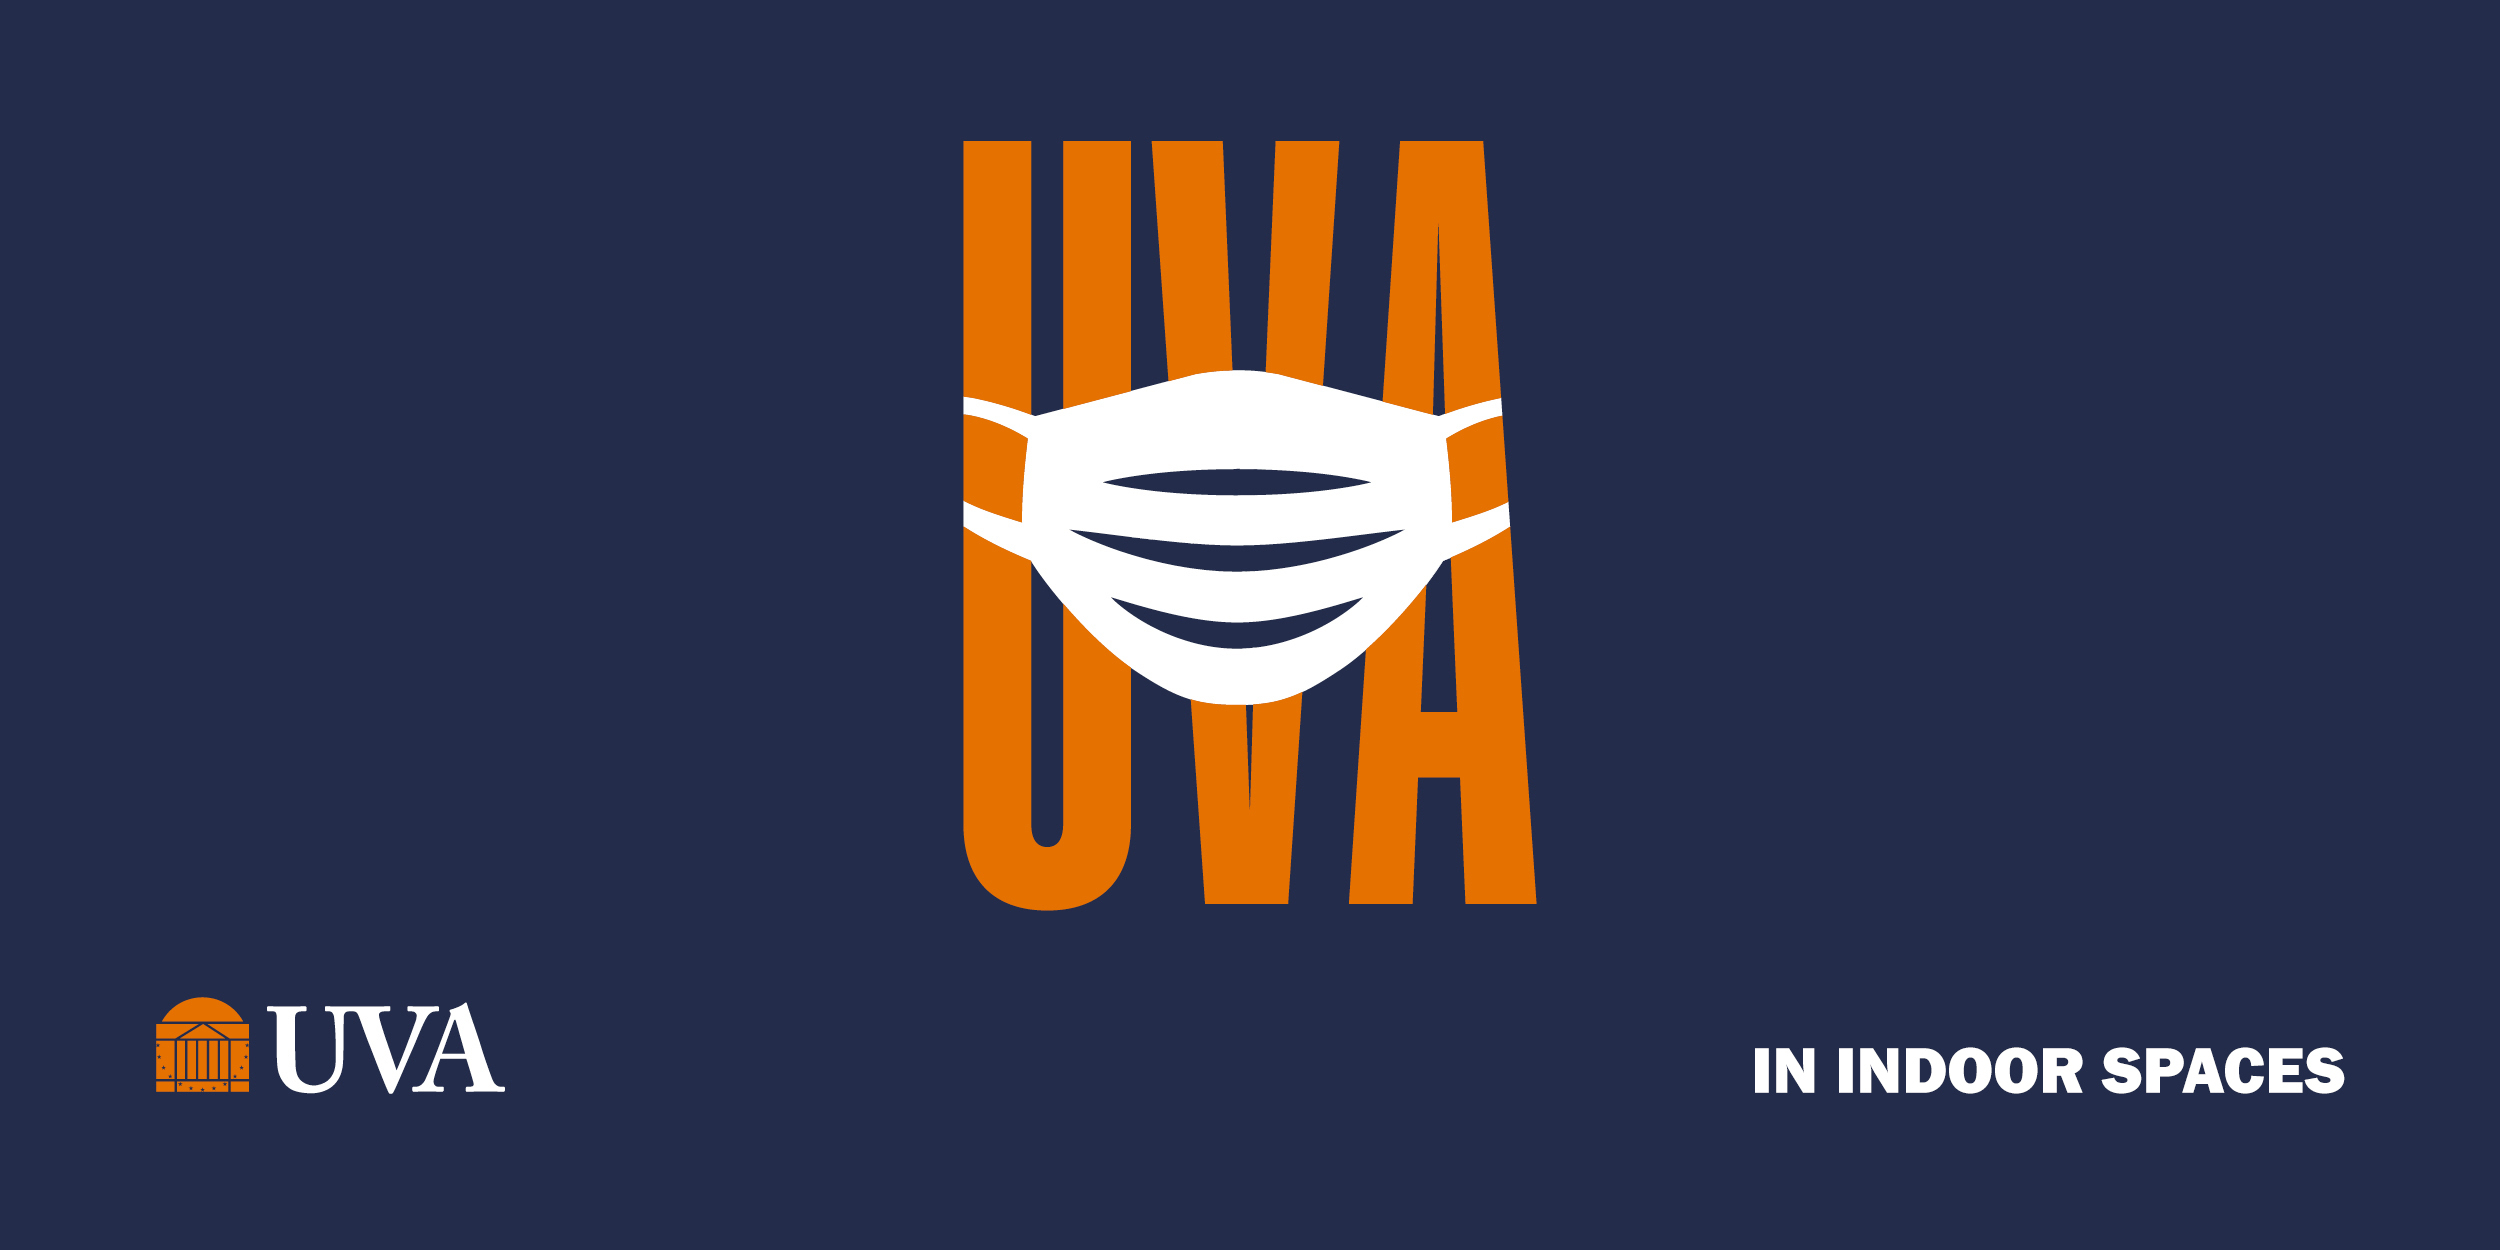 UVA. Mask in indoor spaces.